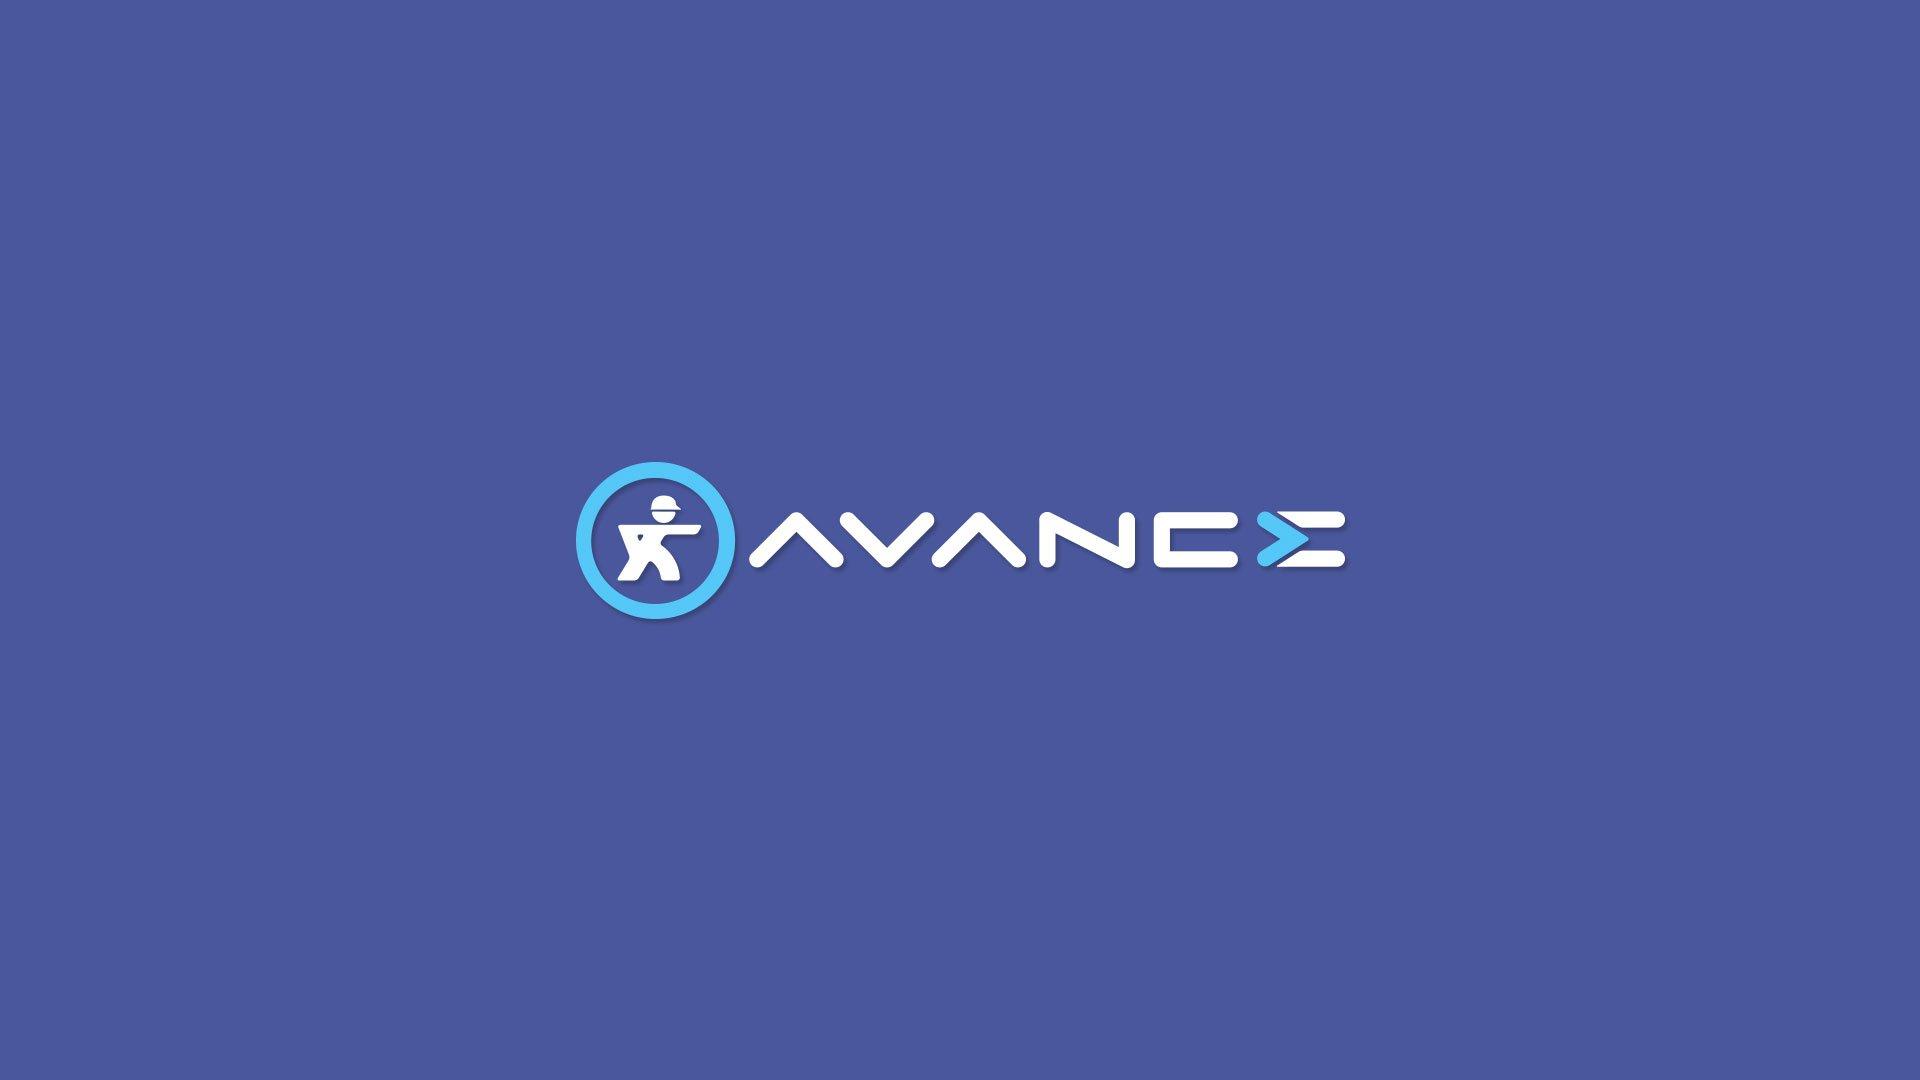 Avance cover